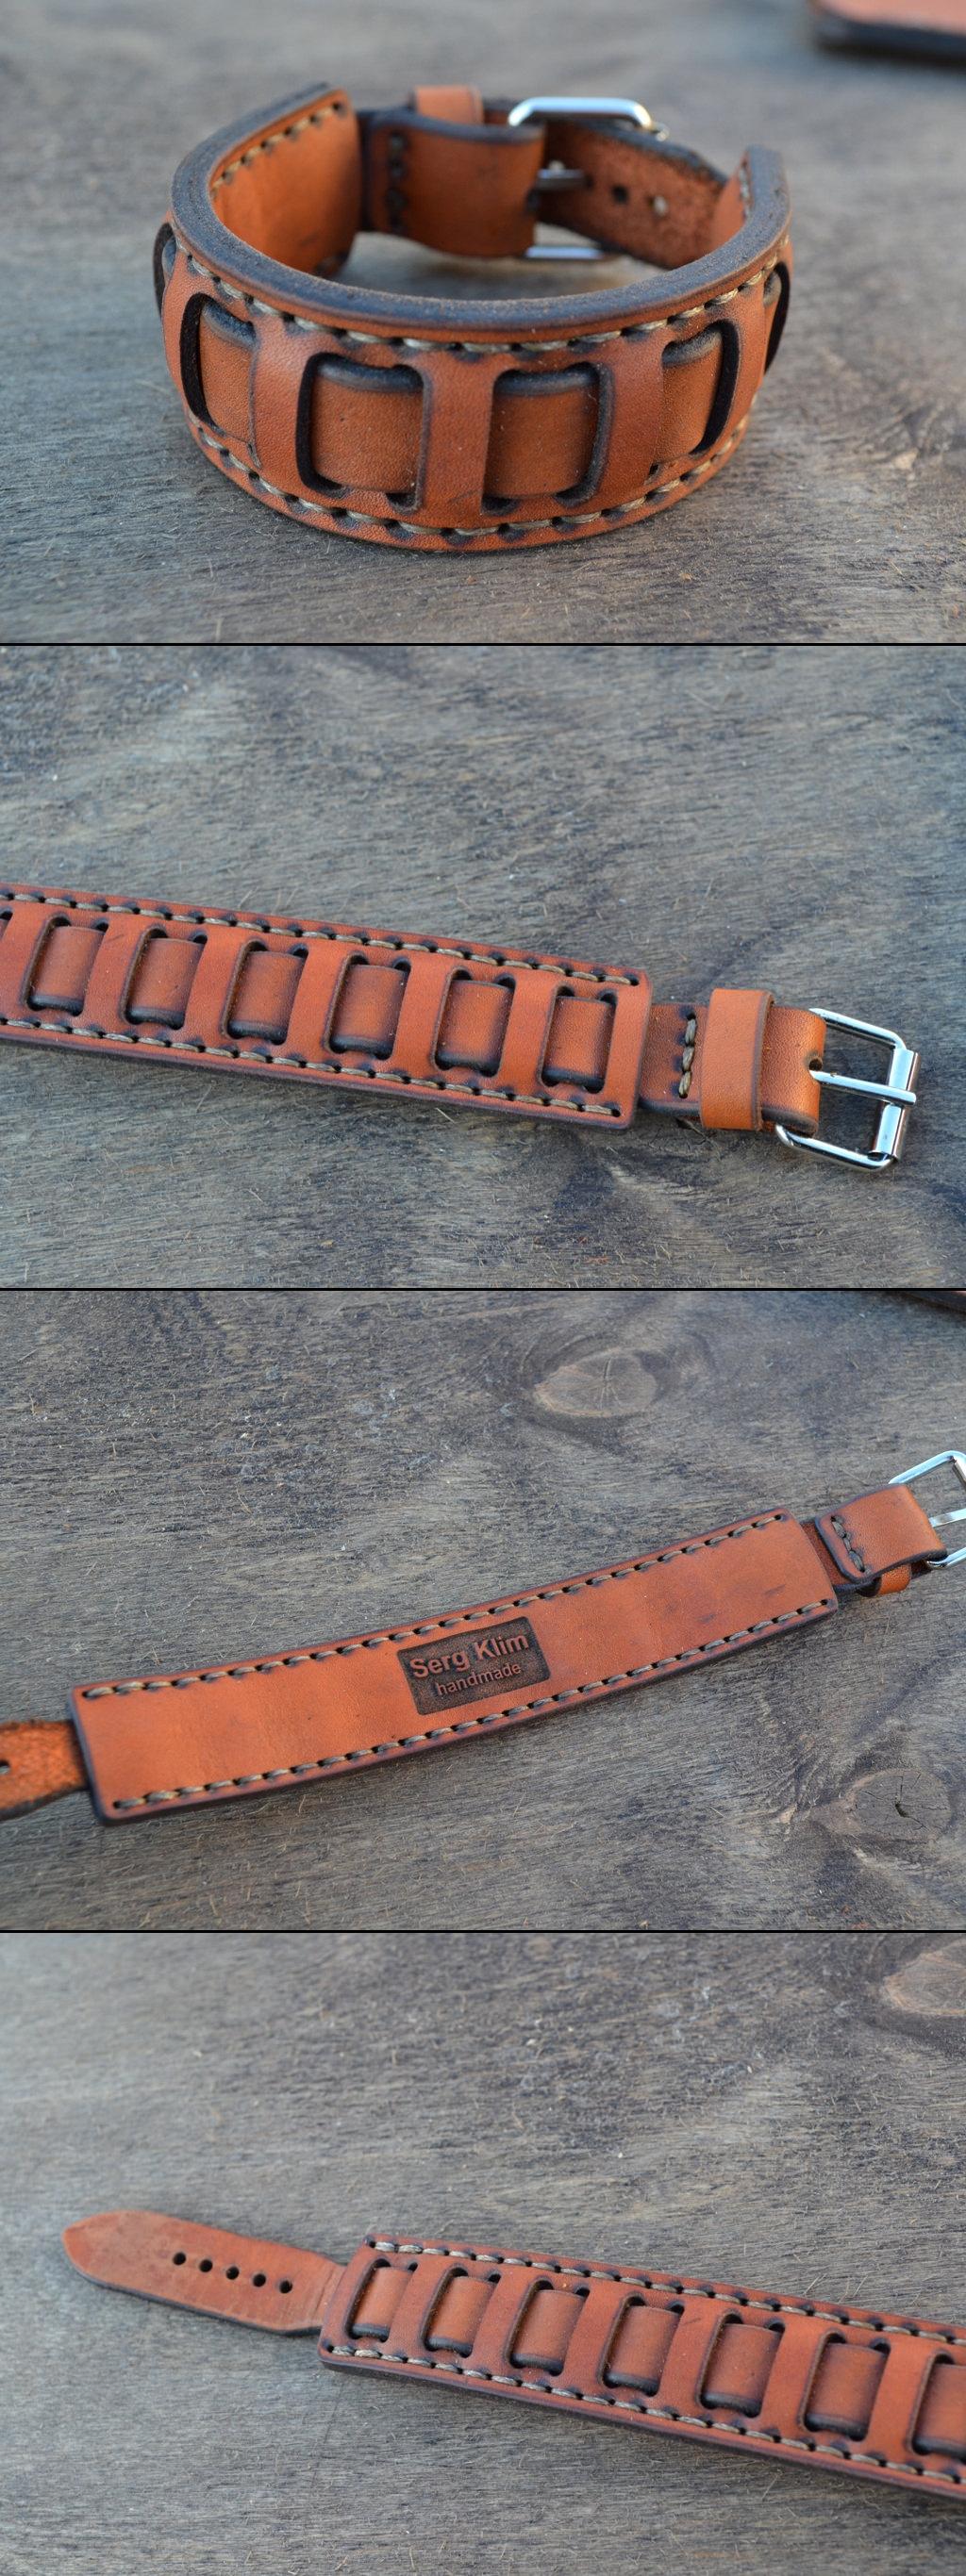 Leather braceletmen Кожаный мужской браслет cuoio pinterest